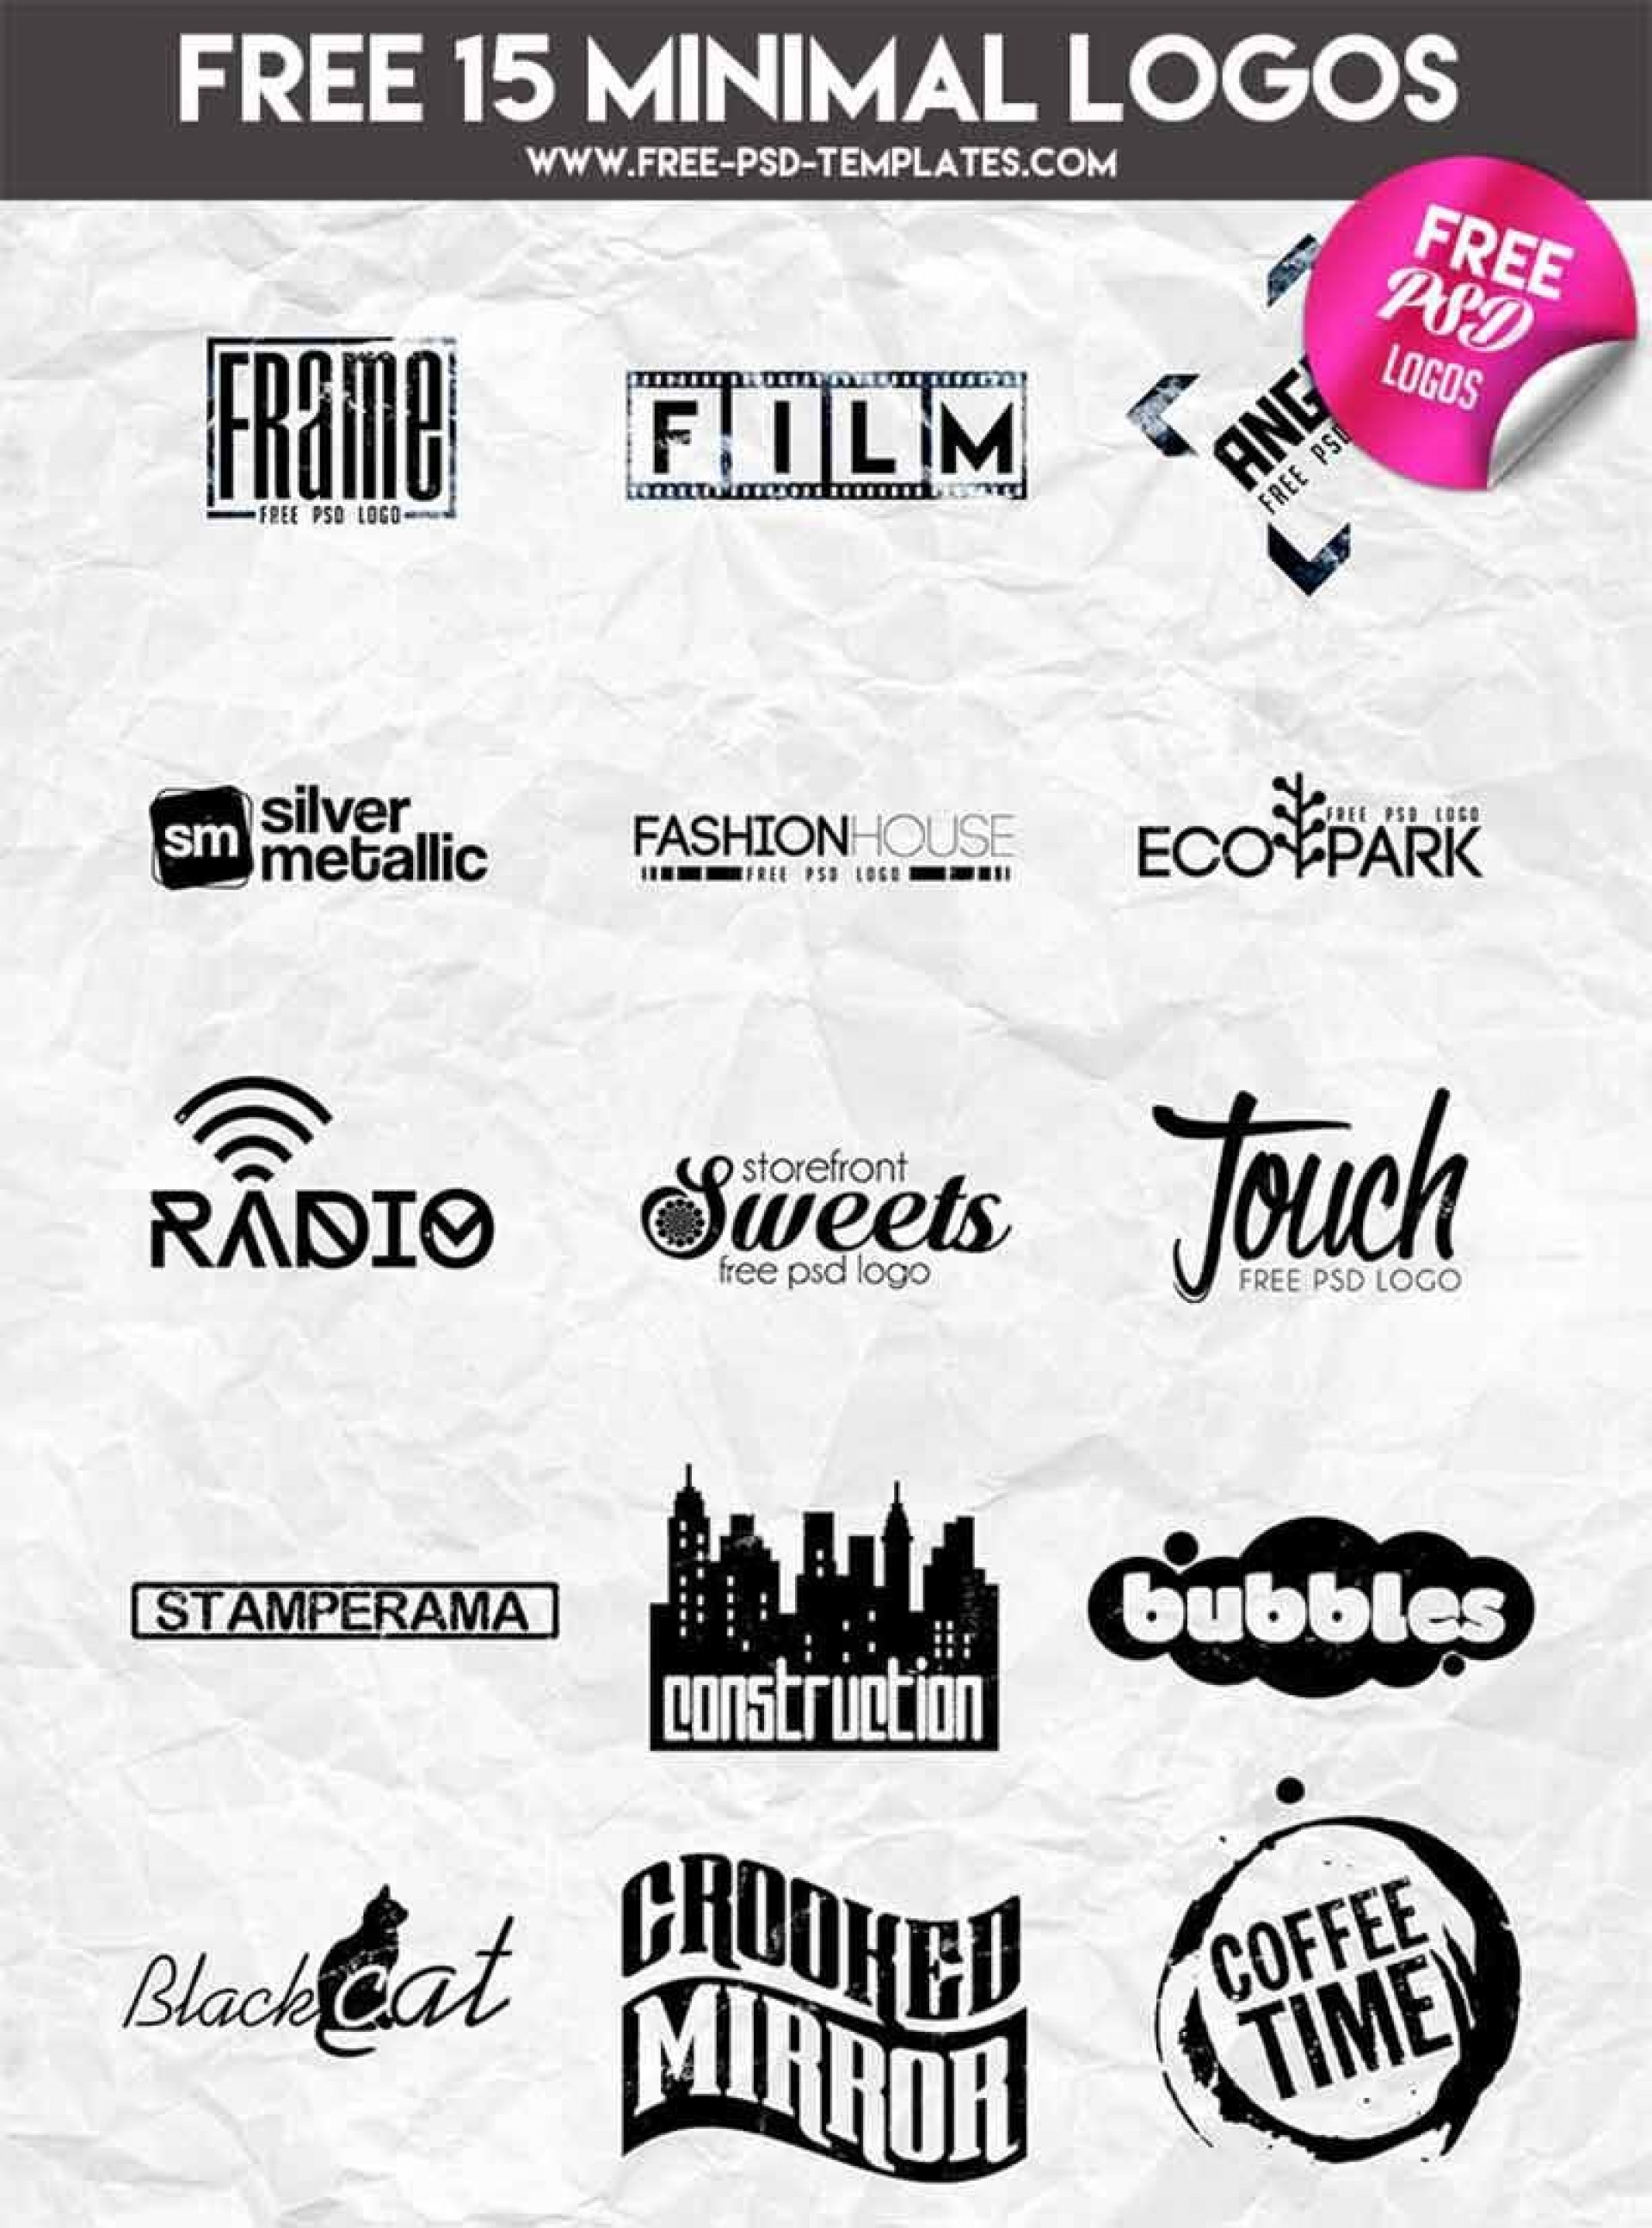 000 Impressive Free Psd Logo Template High Definition  Templates Design For Photographer Dj1920